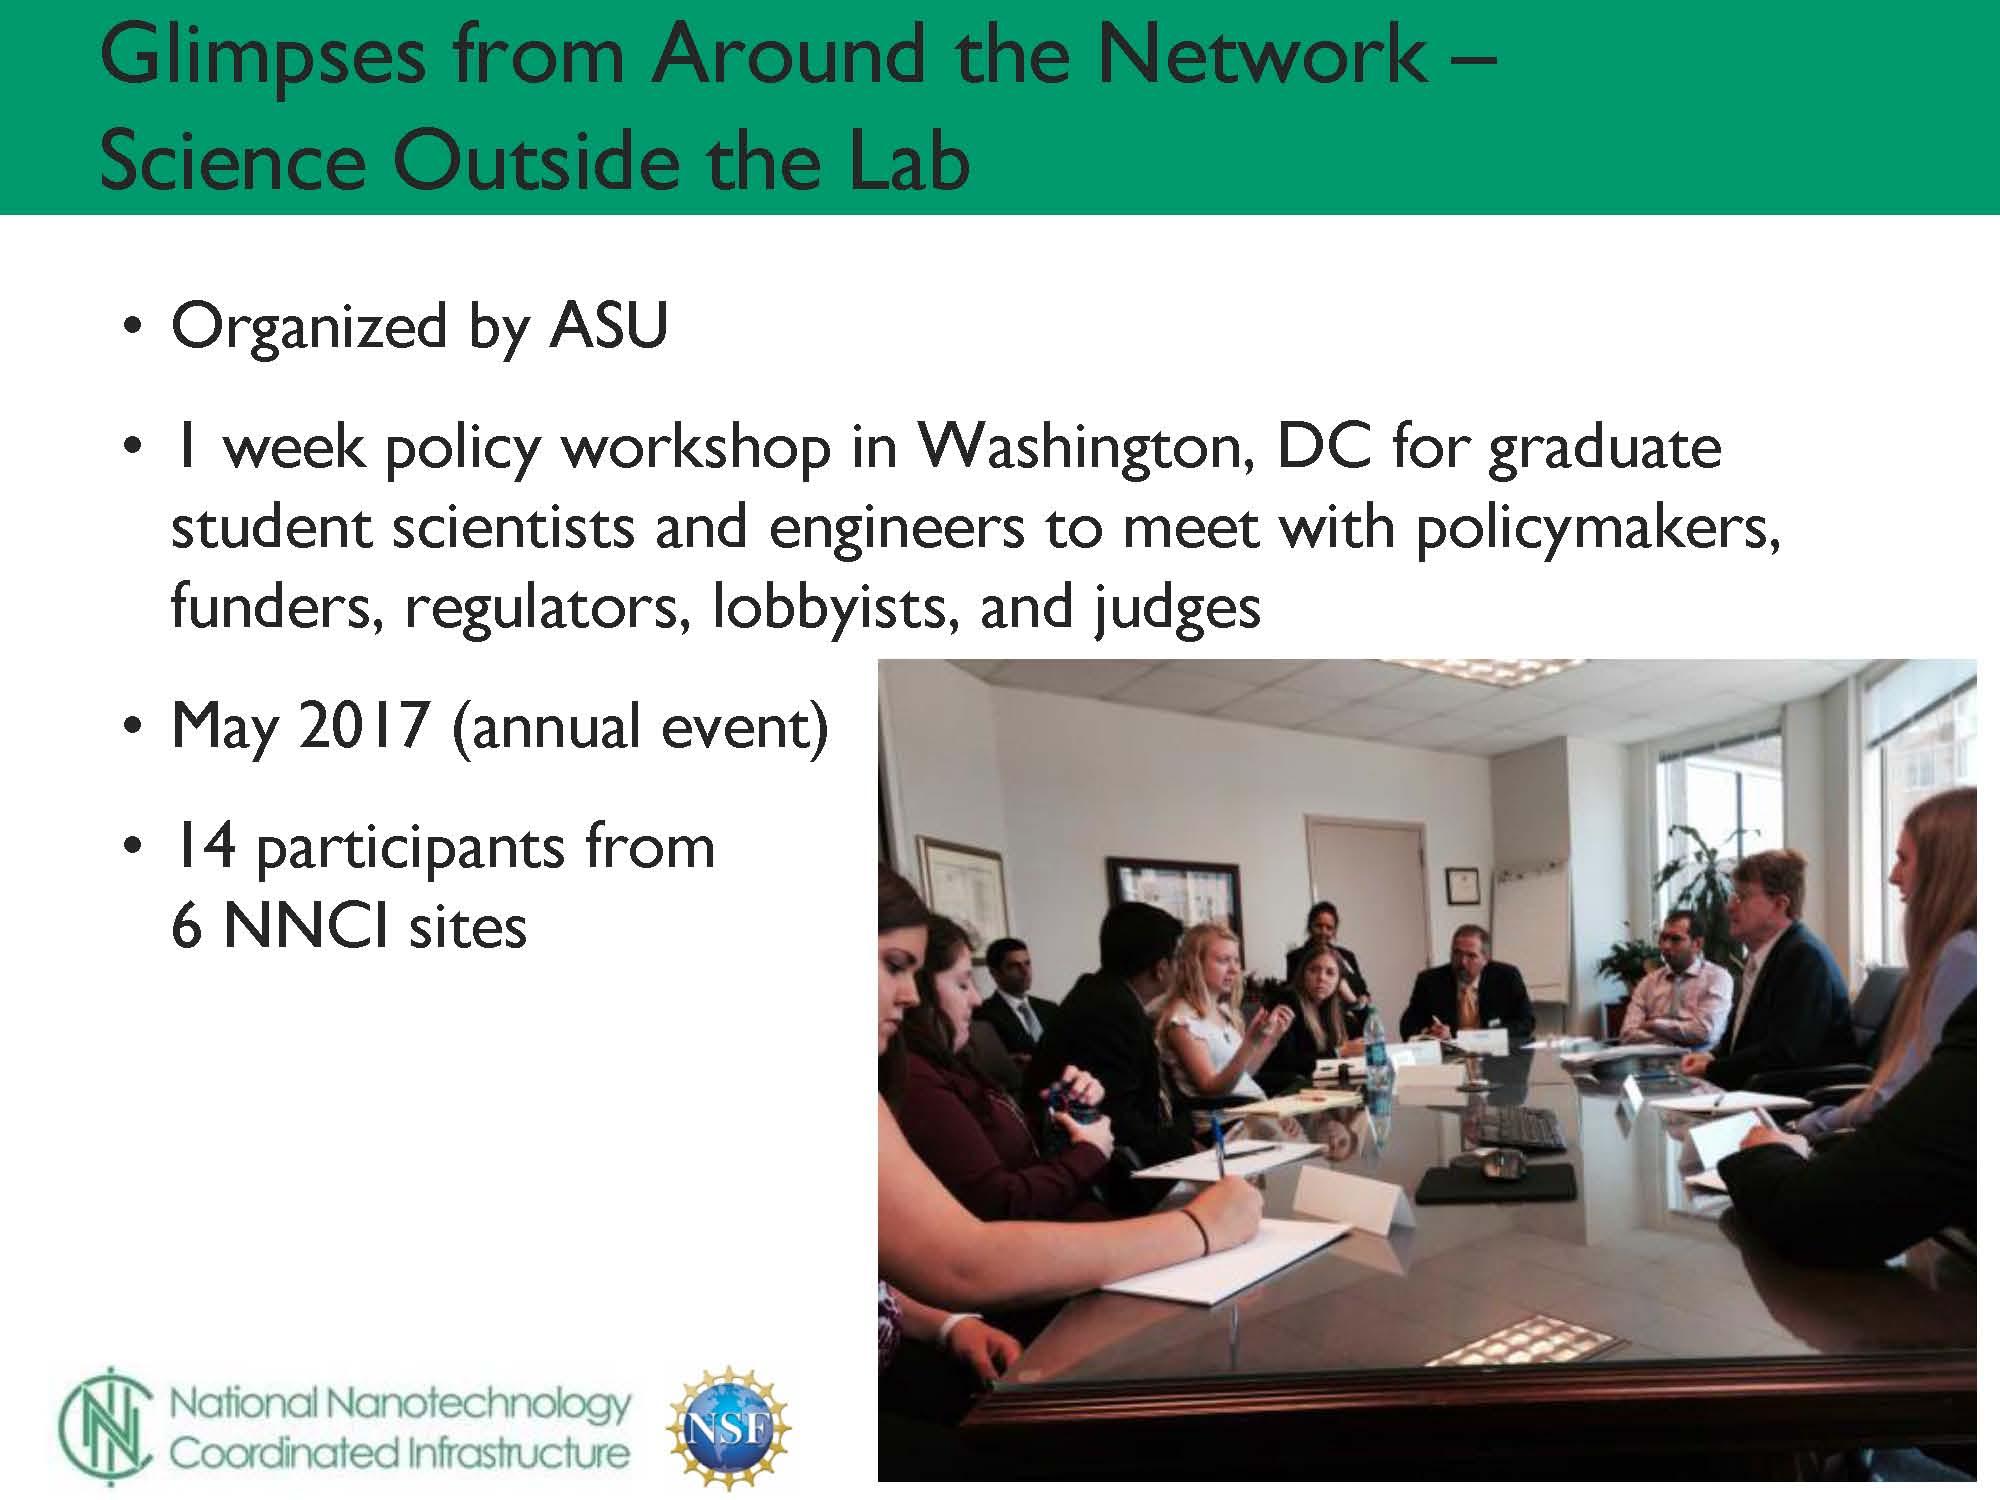 NSF 2017 NanoscienceGrantees Conf - NNCI presentation by Mark Allen_Page_18.jpg